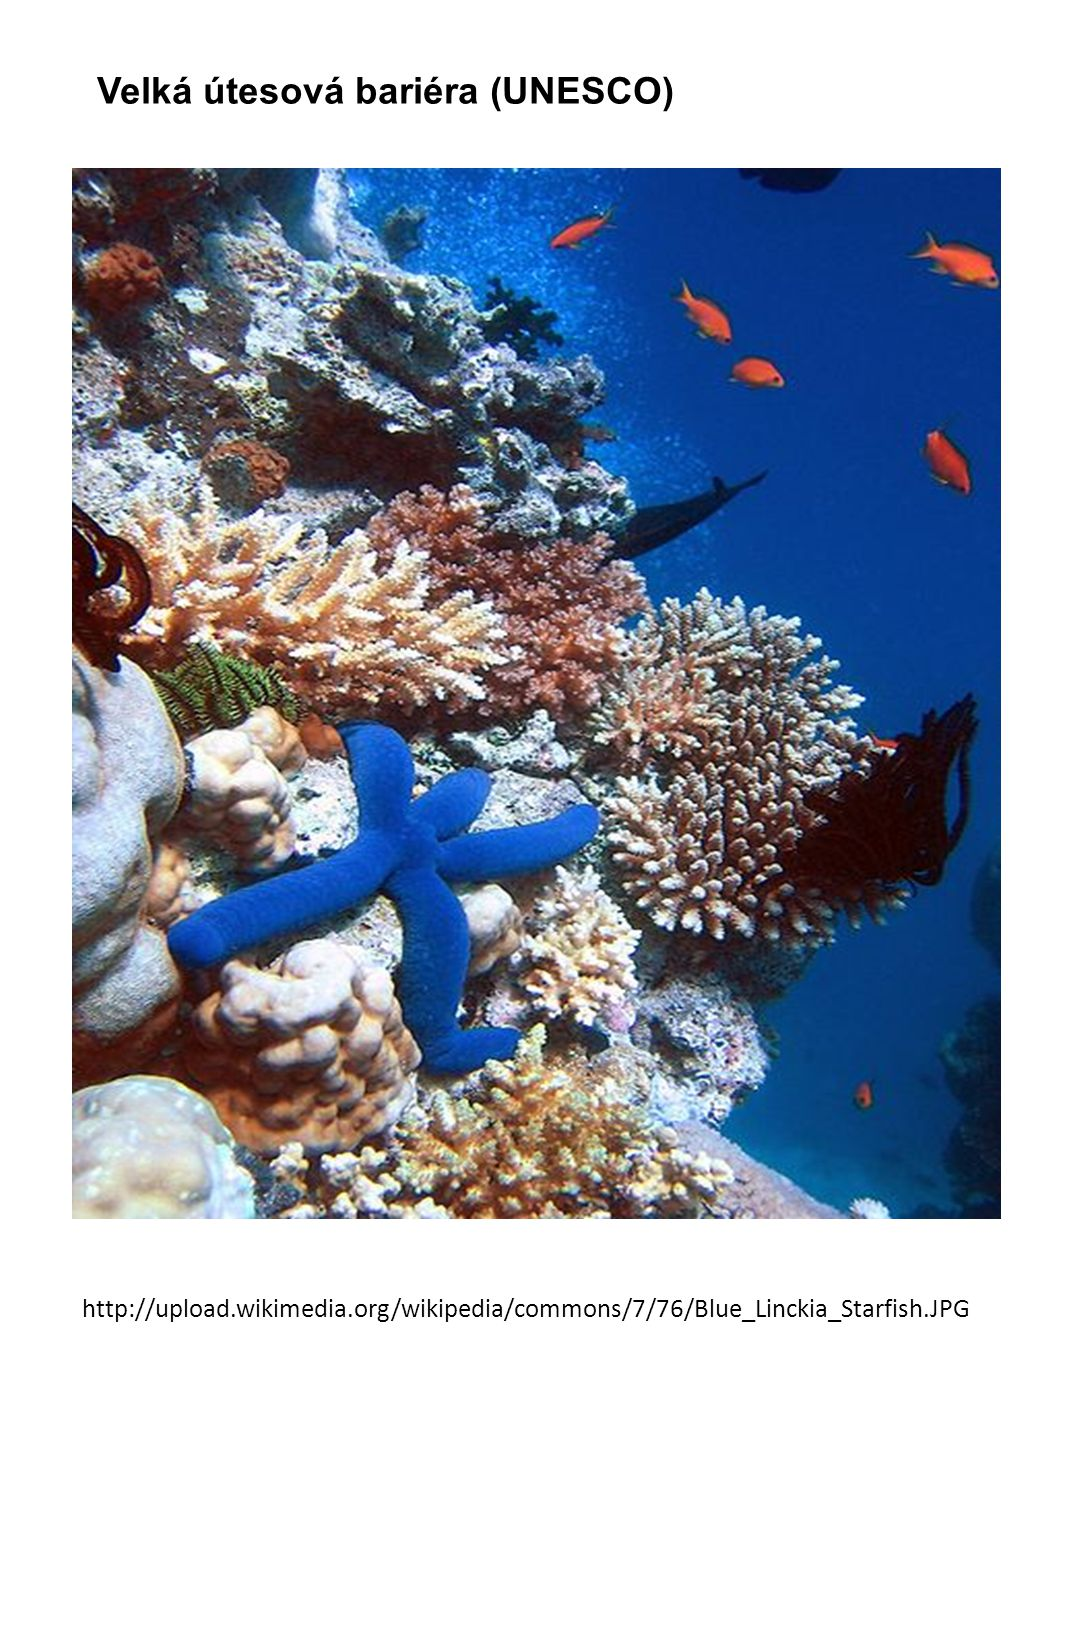 http://upload.wikimedia.org/wikipedia/commons/7/76/Blue_Linckia_Starfish.JPG Velká útesová bariéra (UNESCO)